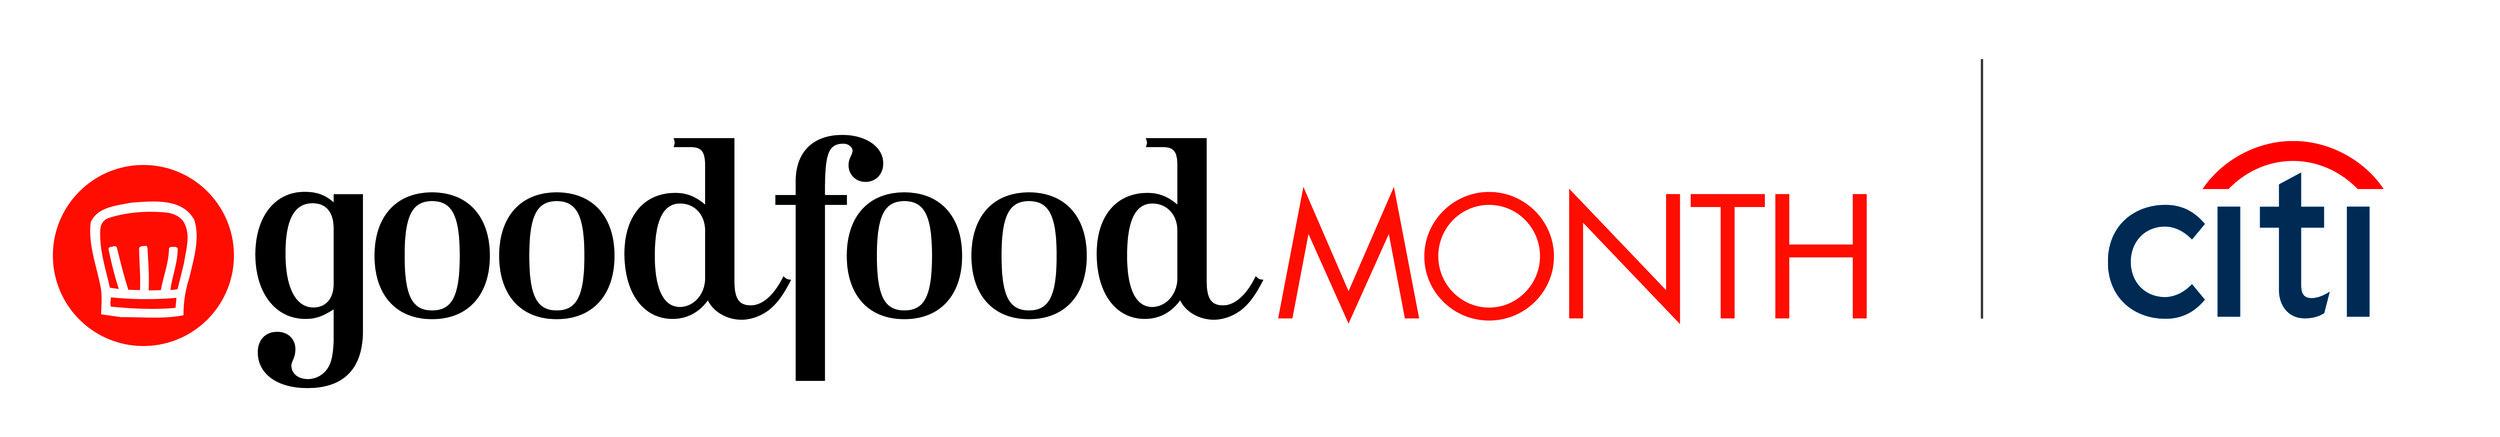 GFM 2019 Logo Small.jpg